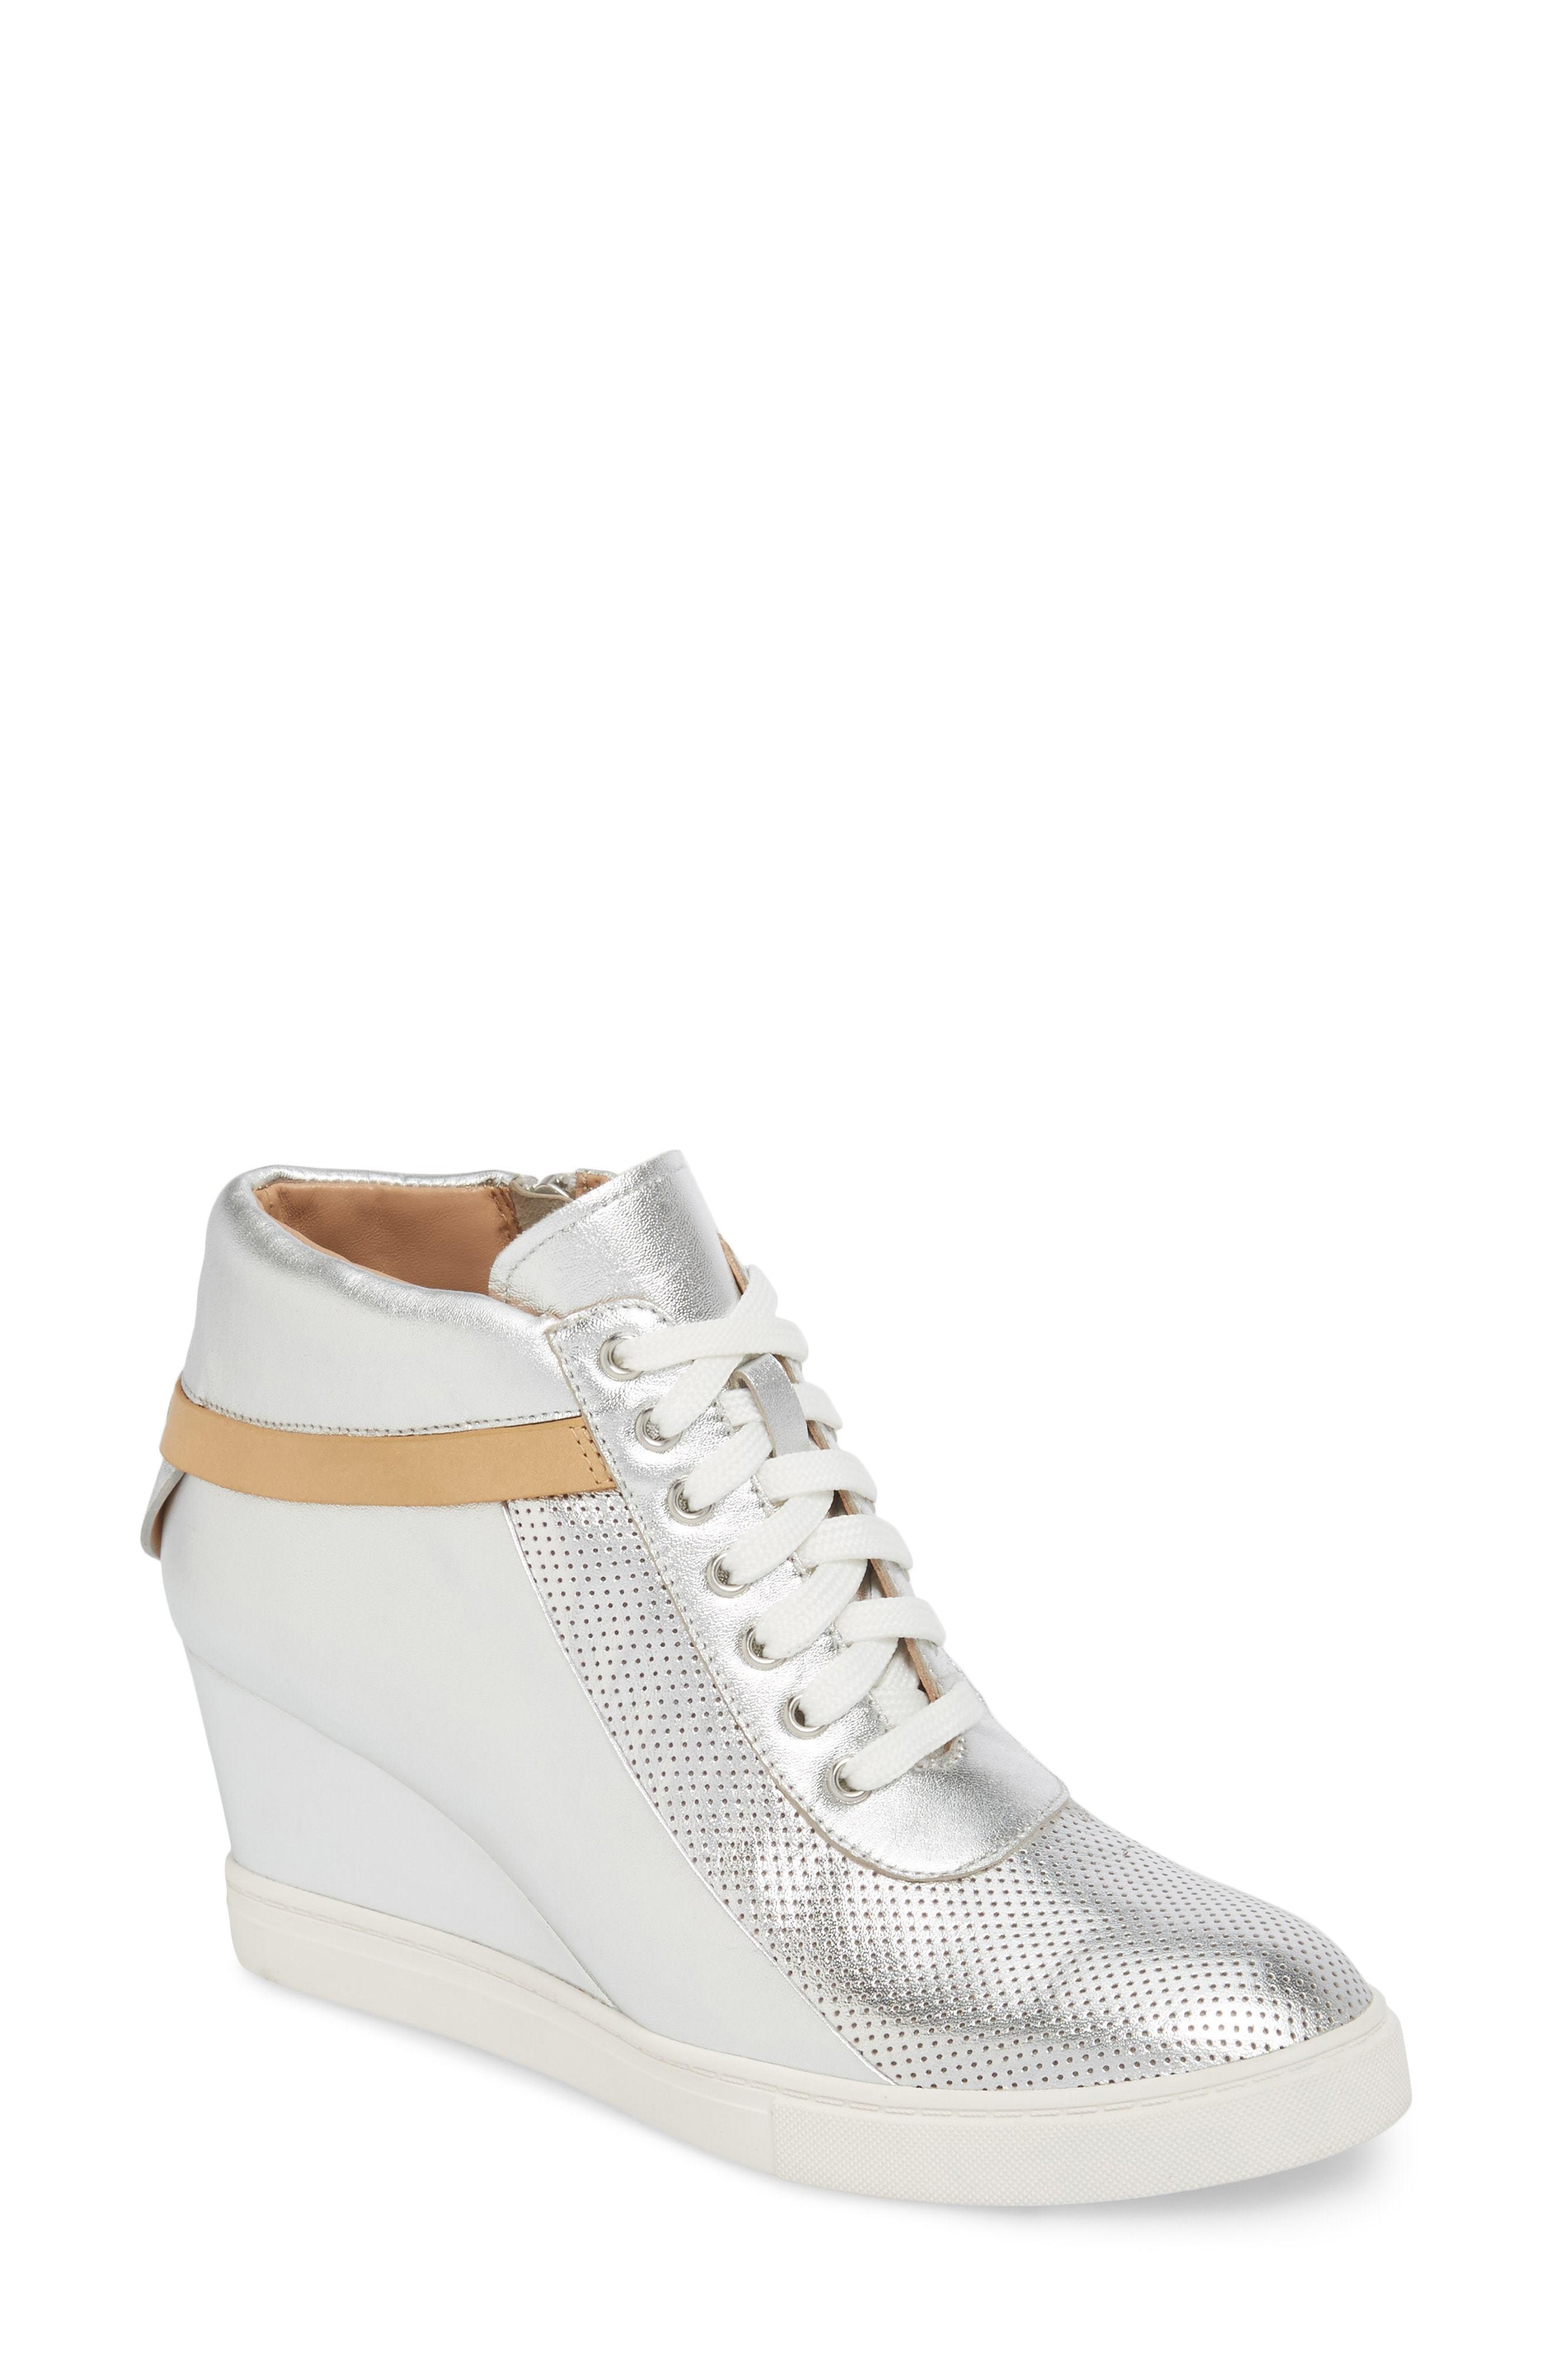 f3bfa802b13e Freja Wedge Sneaker. Silver Leather Wedge Sneakers by Linea Paolo